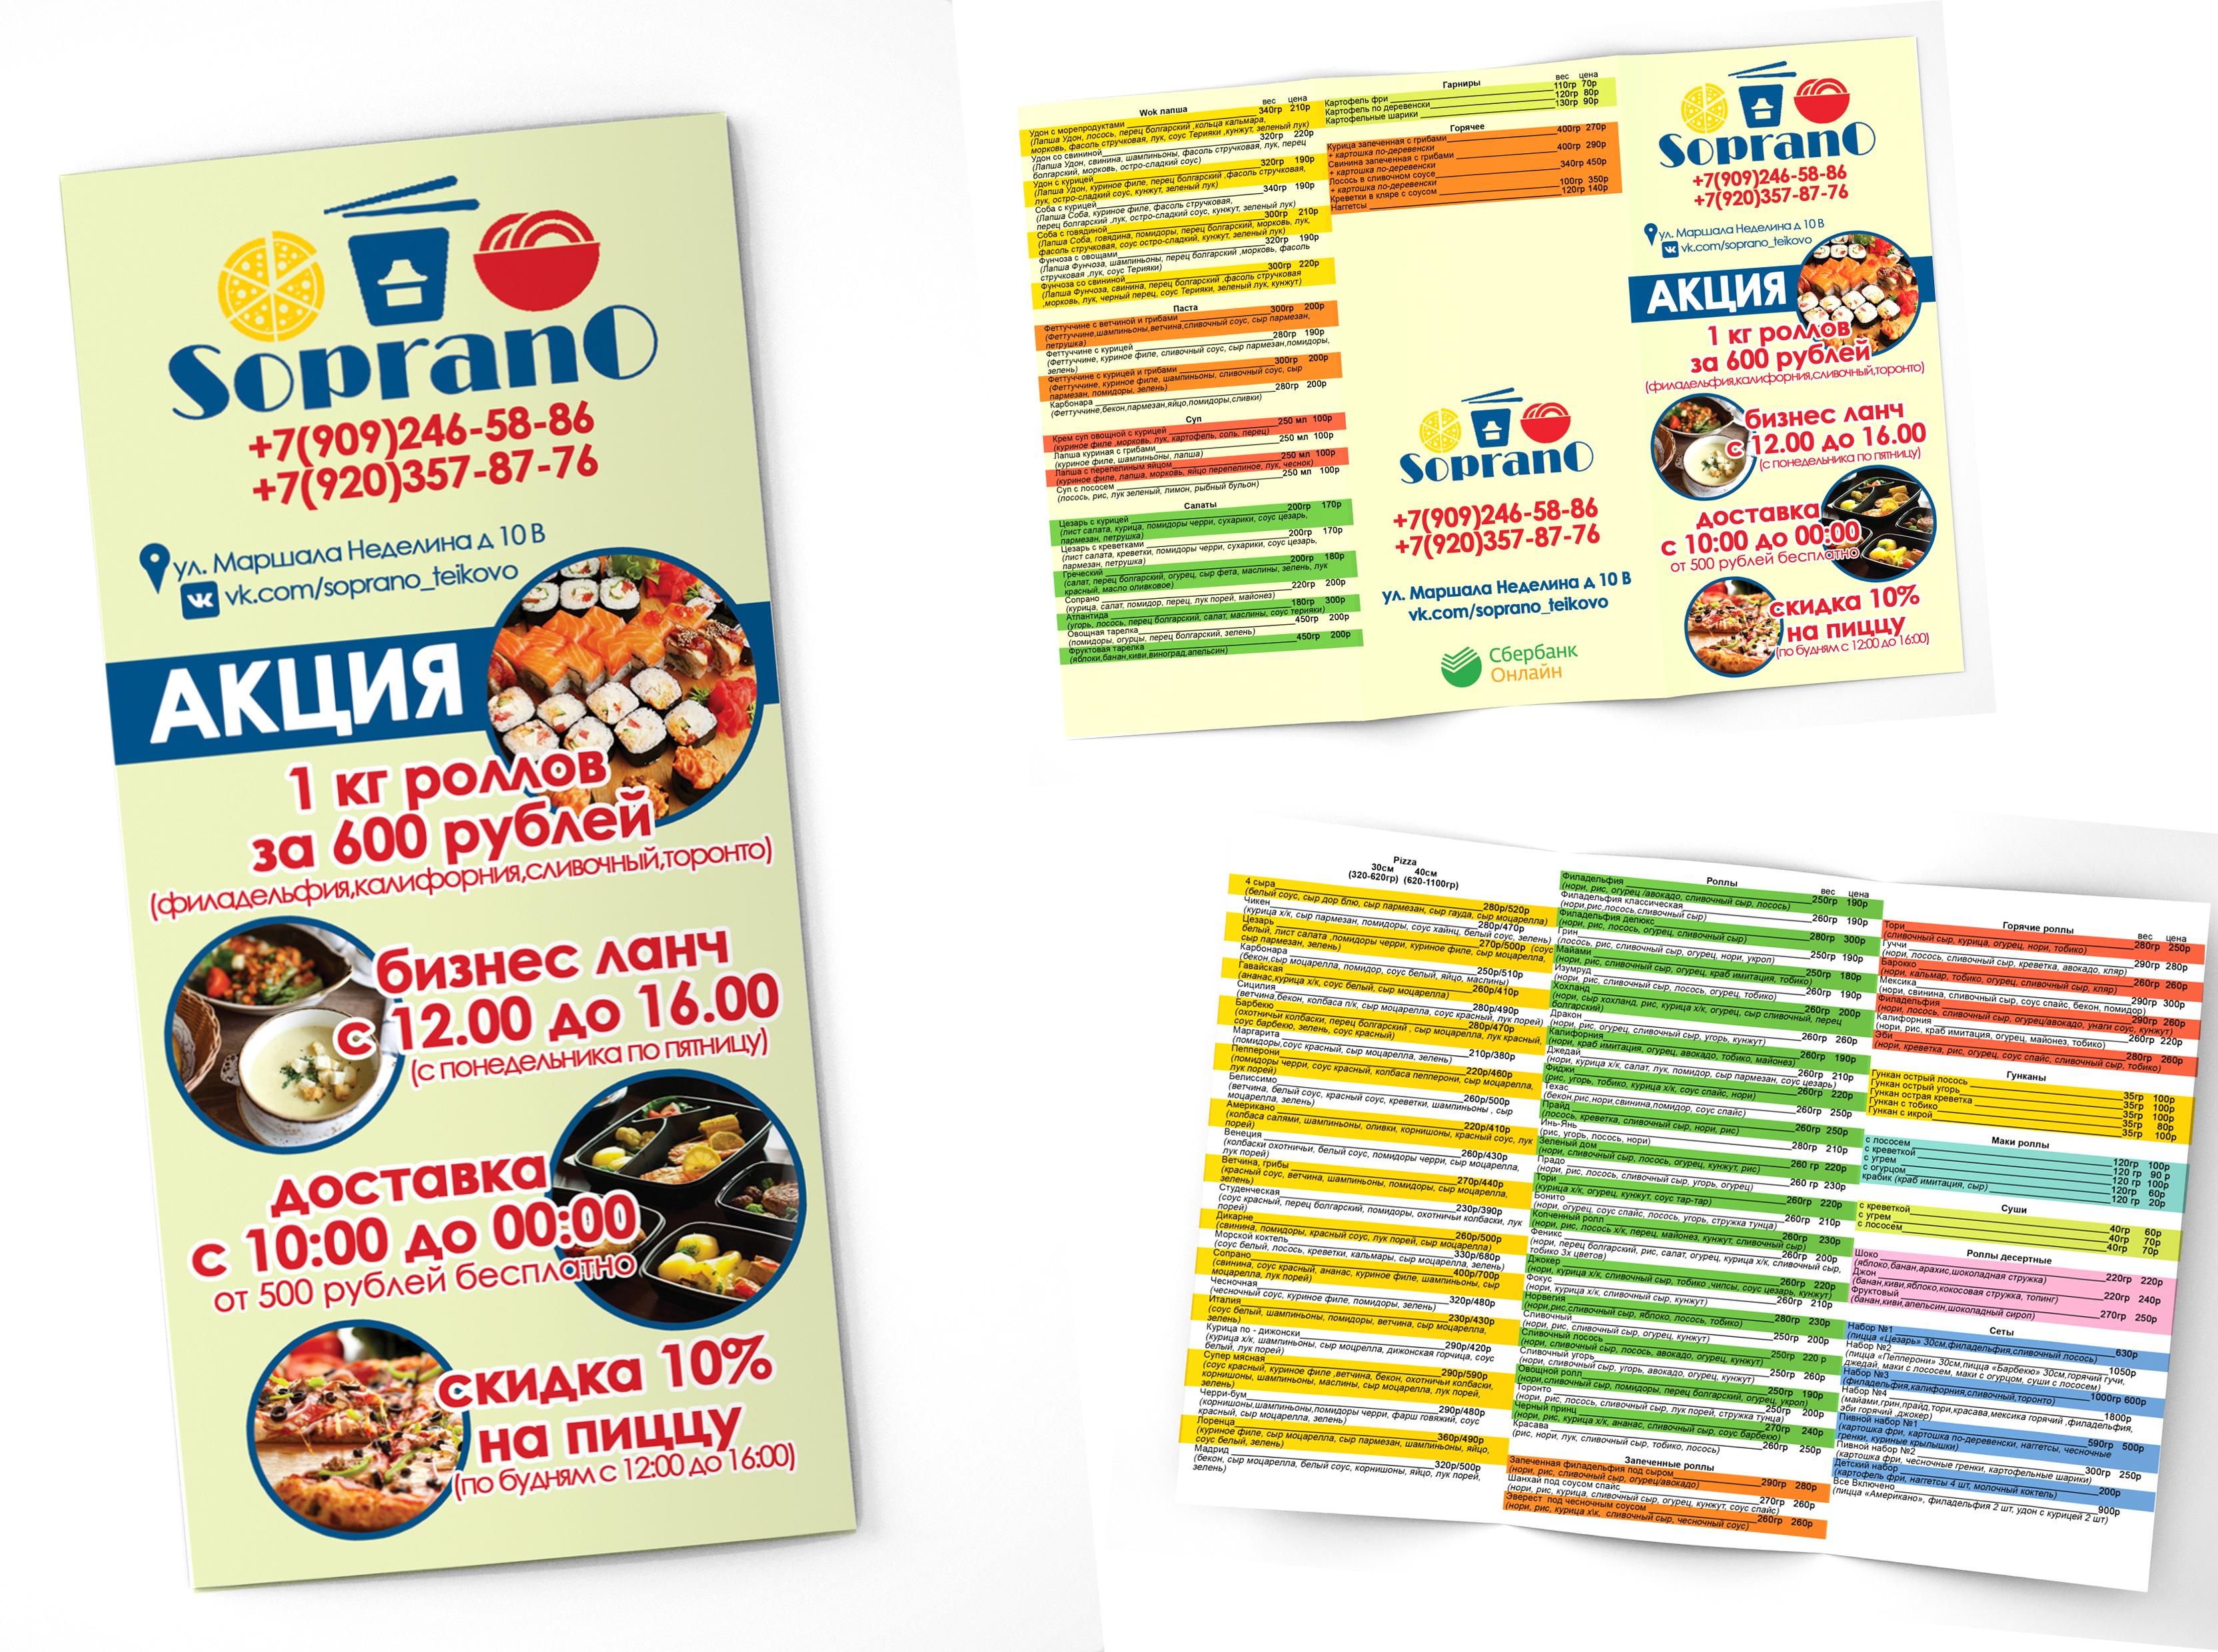 Буклет-меню для доставки. Ресторан Soprano